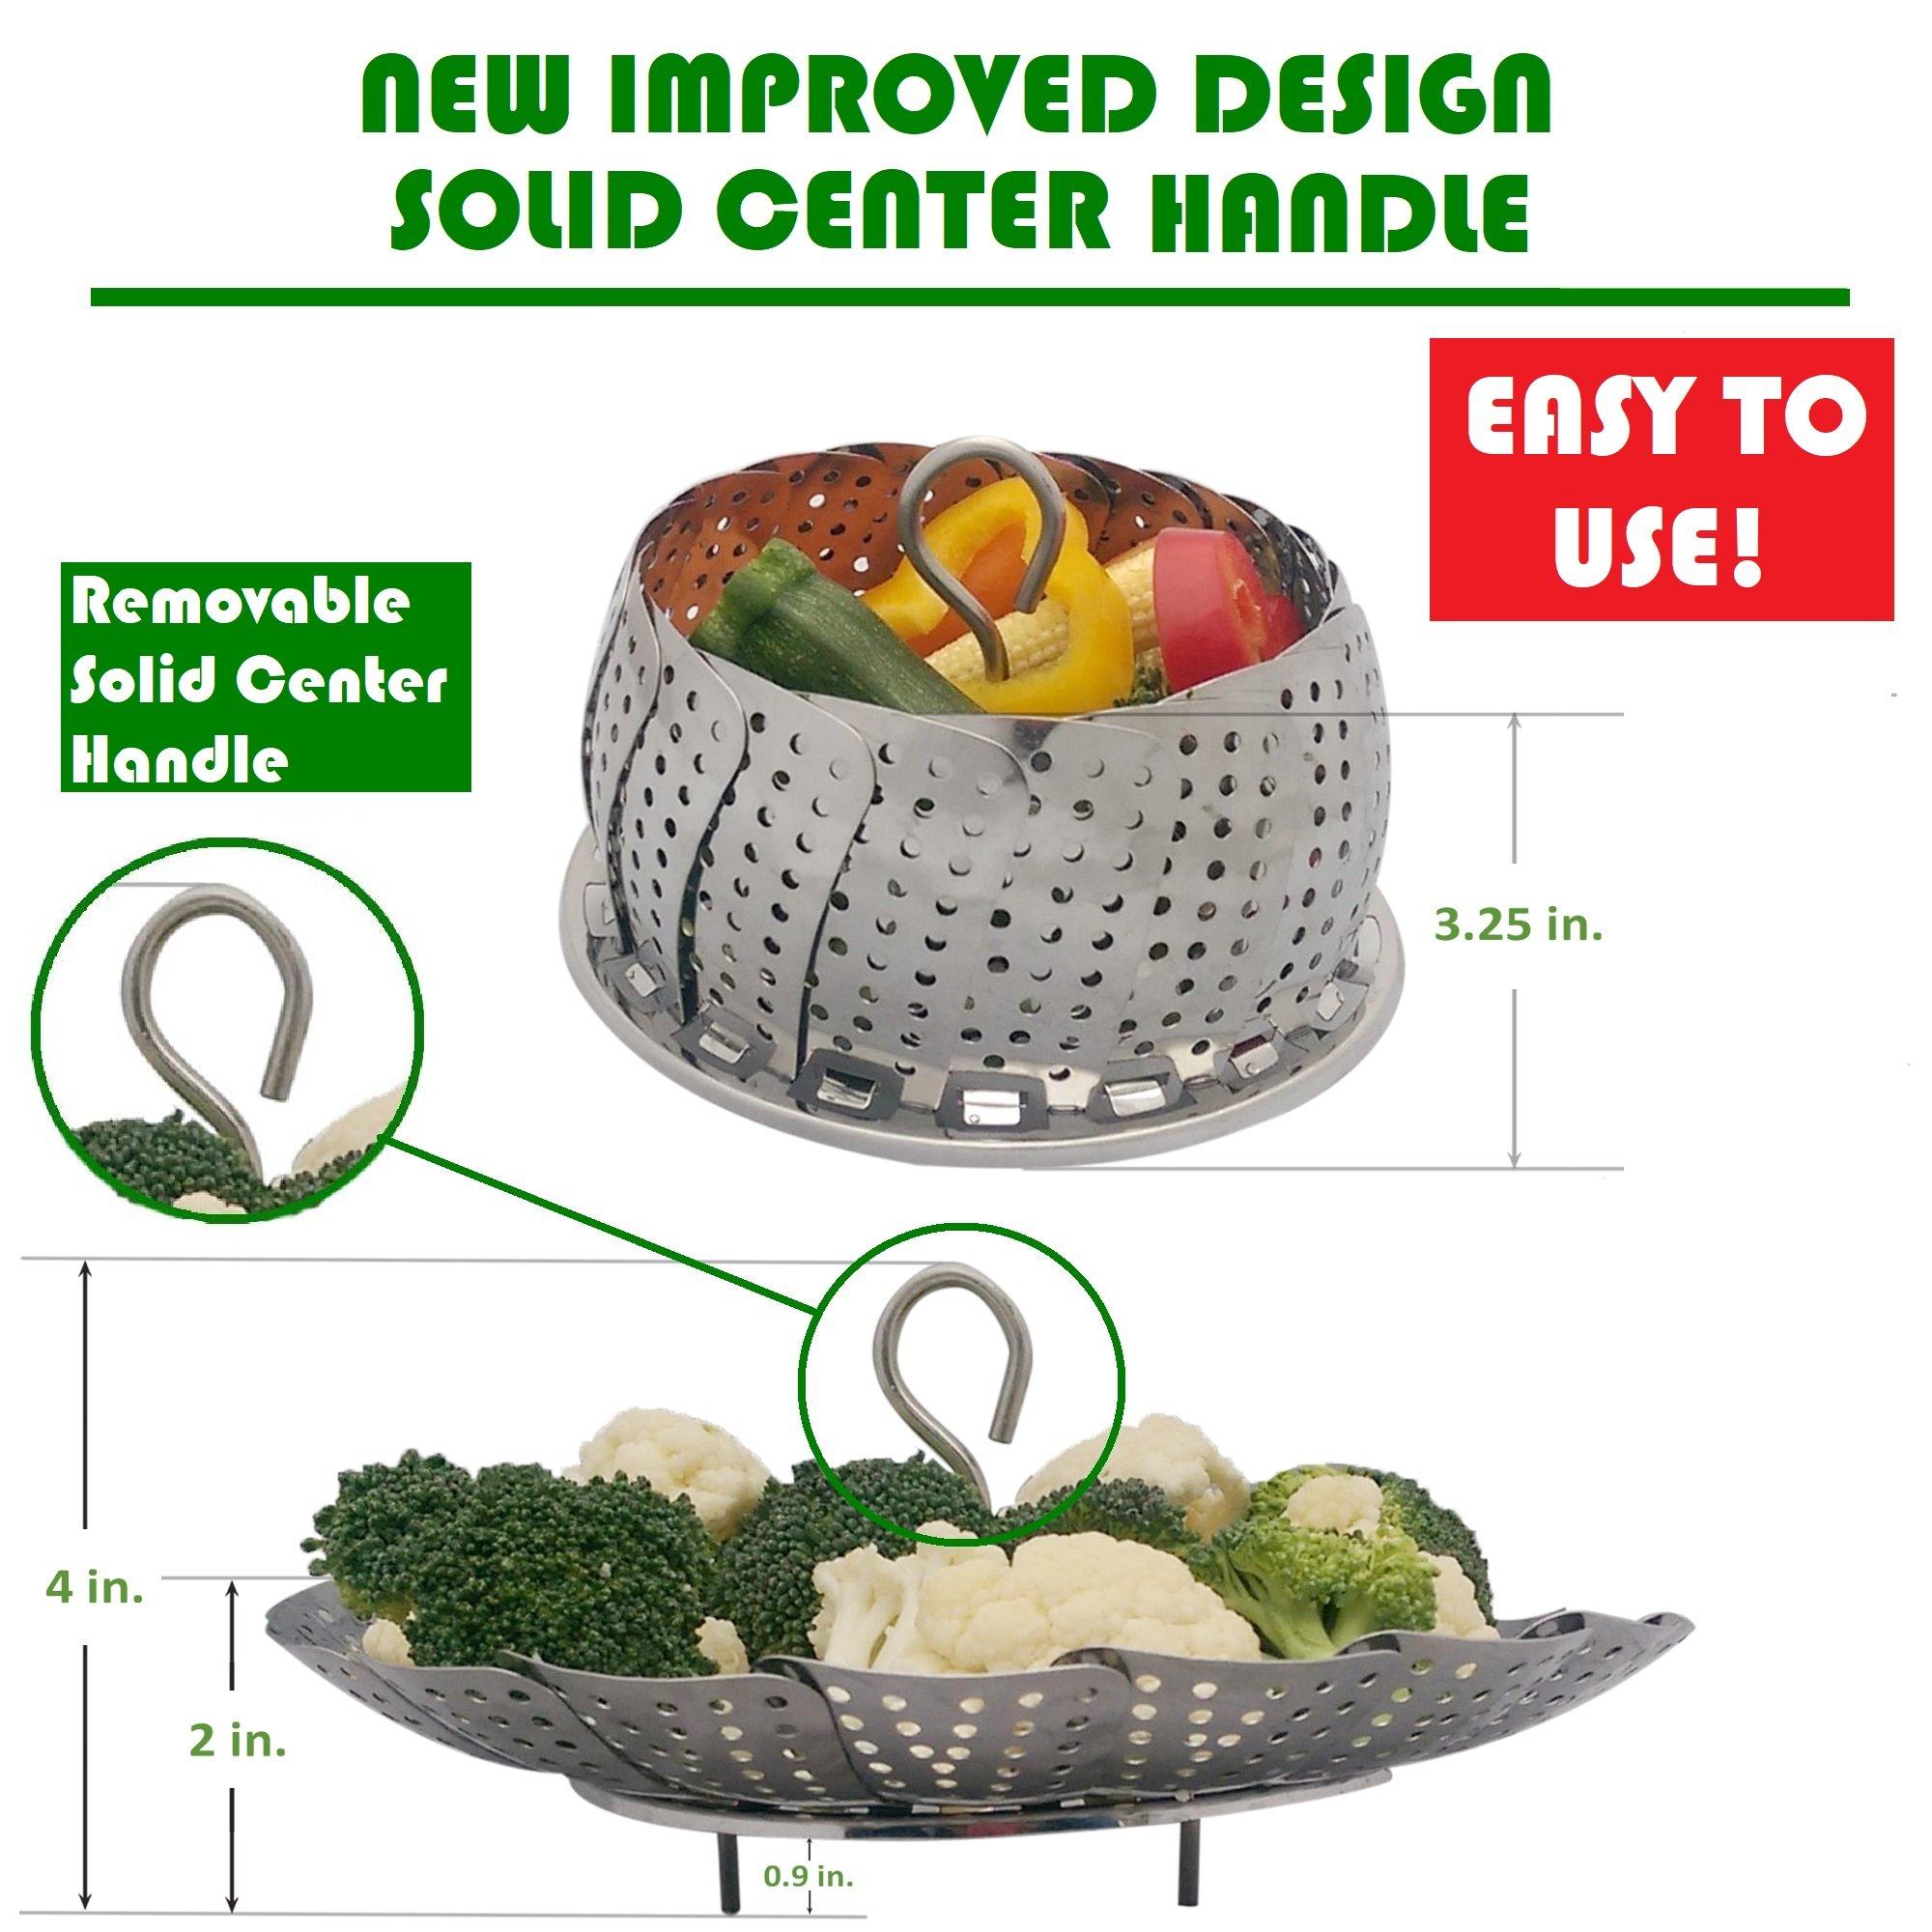 PREMIUM Vegetable Steamer Basket - BEST Bundle - Fits Instant Pot Pressure Cooker 3,5,6 Qt & 8 Quart - 100% Stainless Steel - BONUS Accessories - Safety Tool + eBook + Peeler | For Instapot - Egg Rack by kitchen deluxe (Image #3)